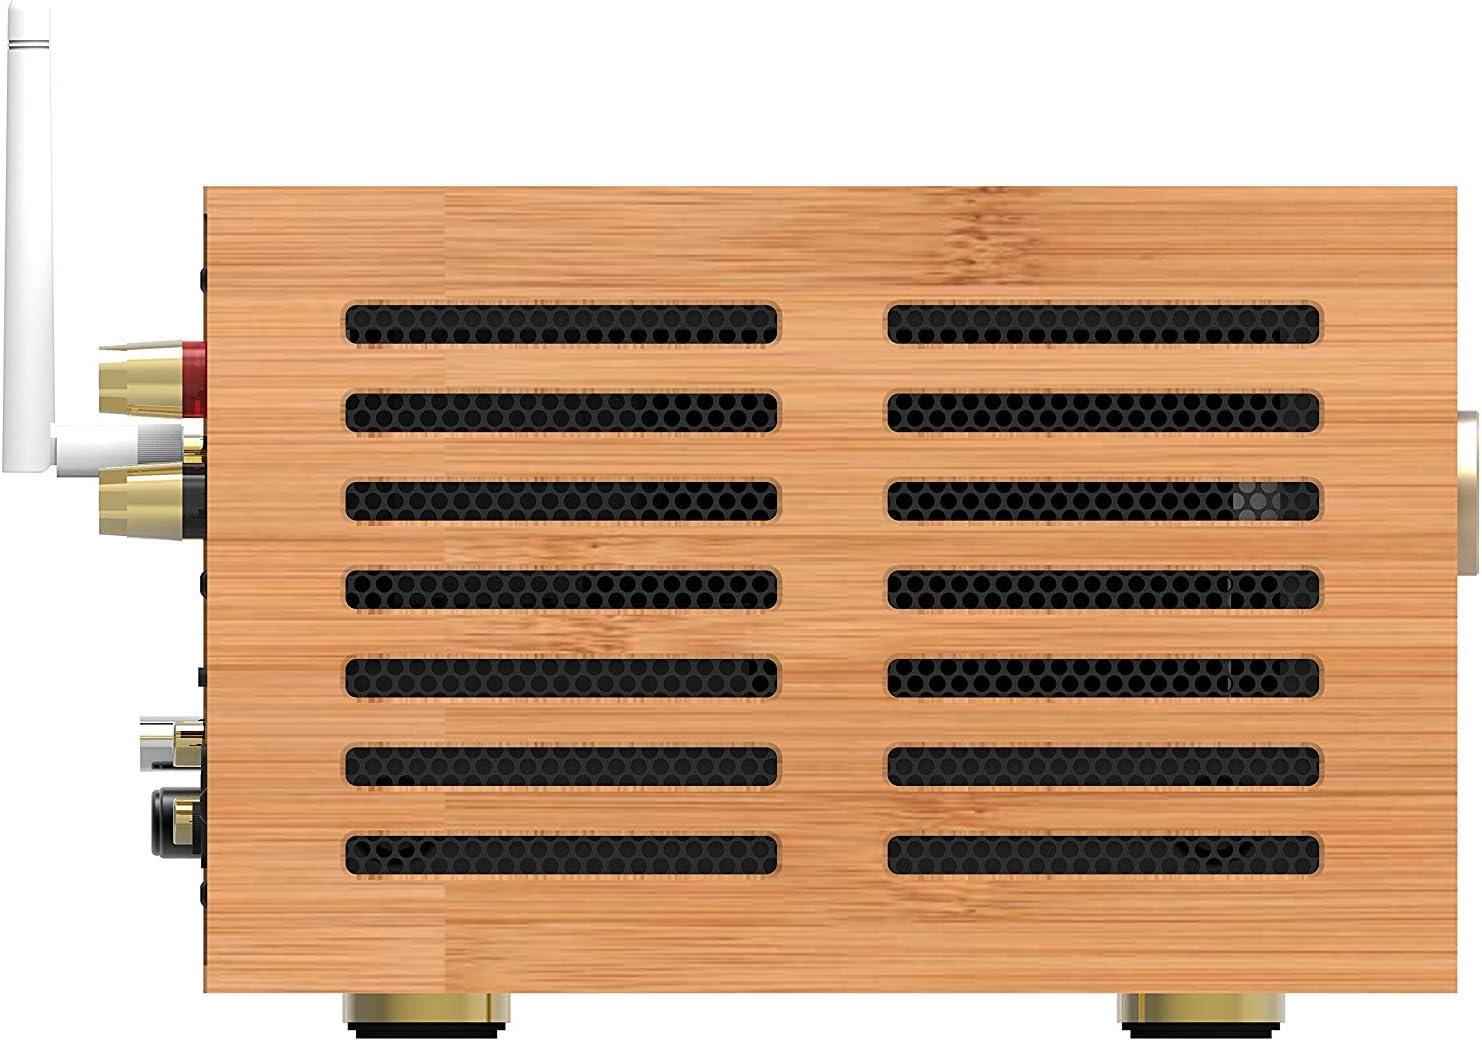 Amazon.com: iFi Audio Retro 50 Tubo de aspiración integrado ...